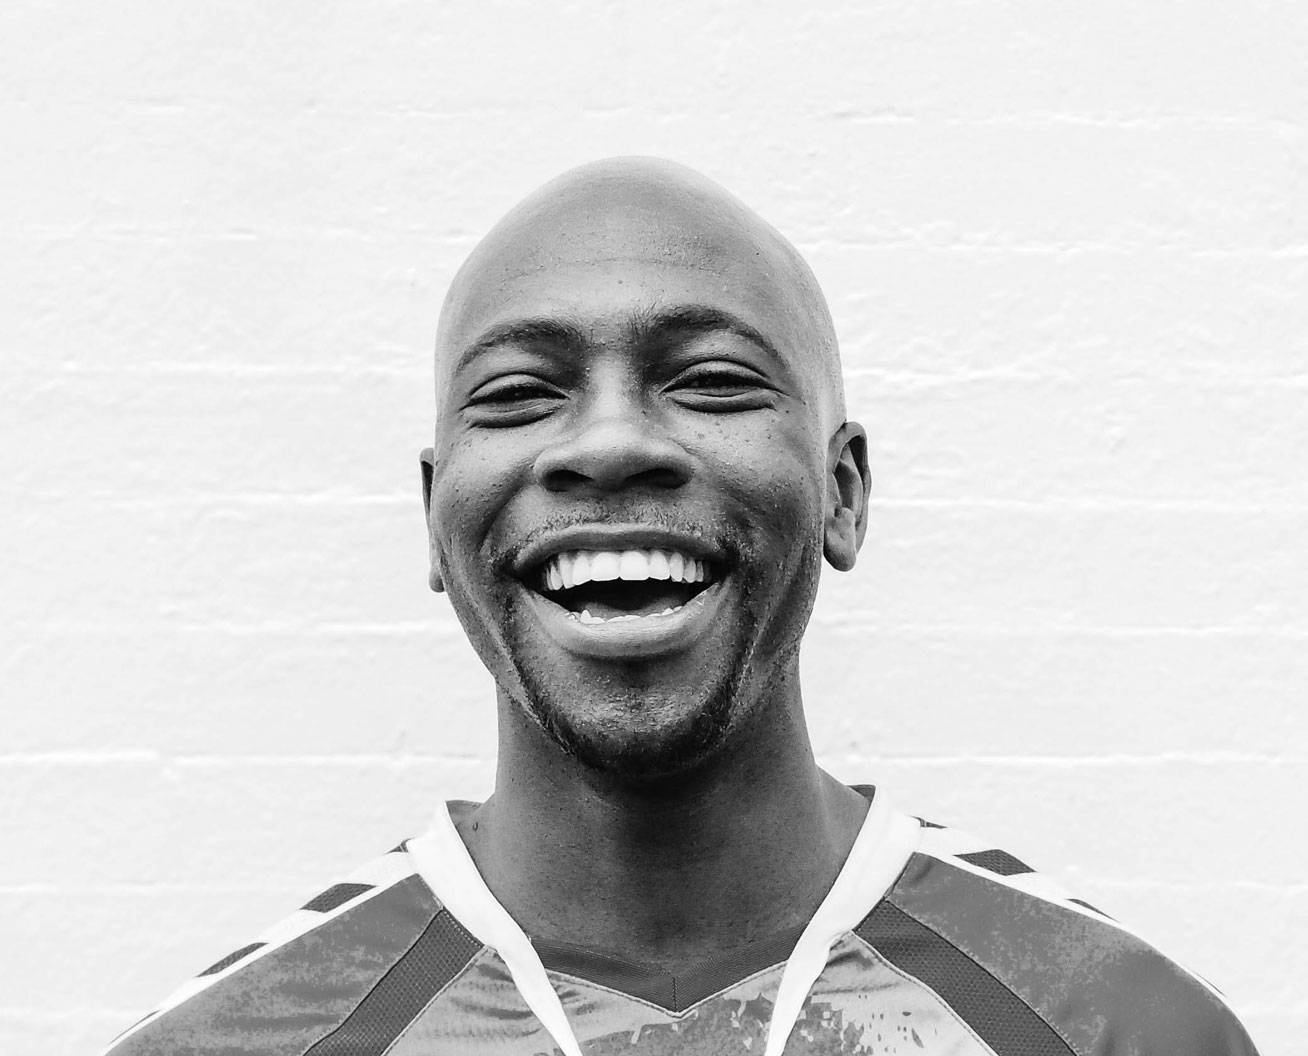 Portrait shot of a bald man smiling at camera